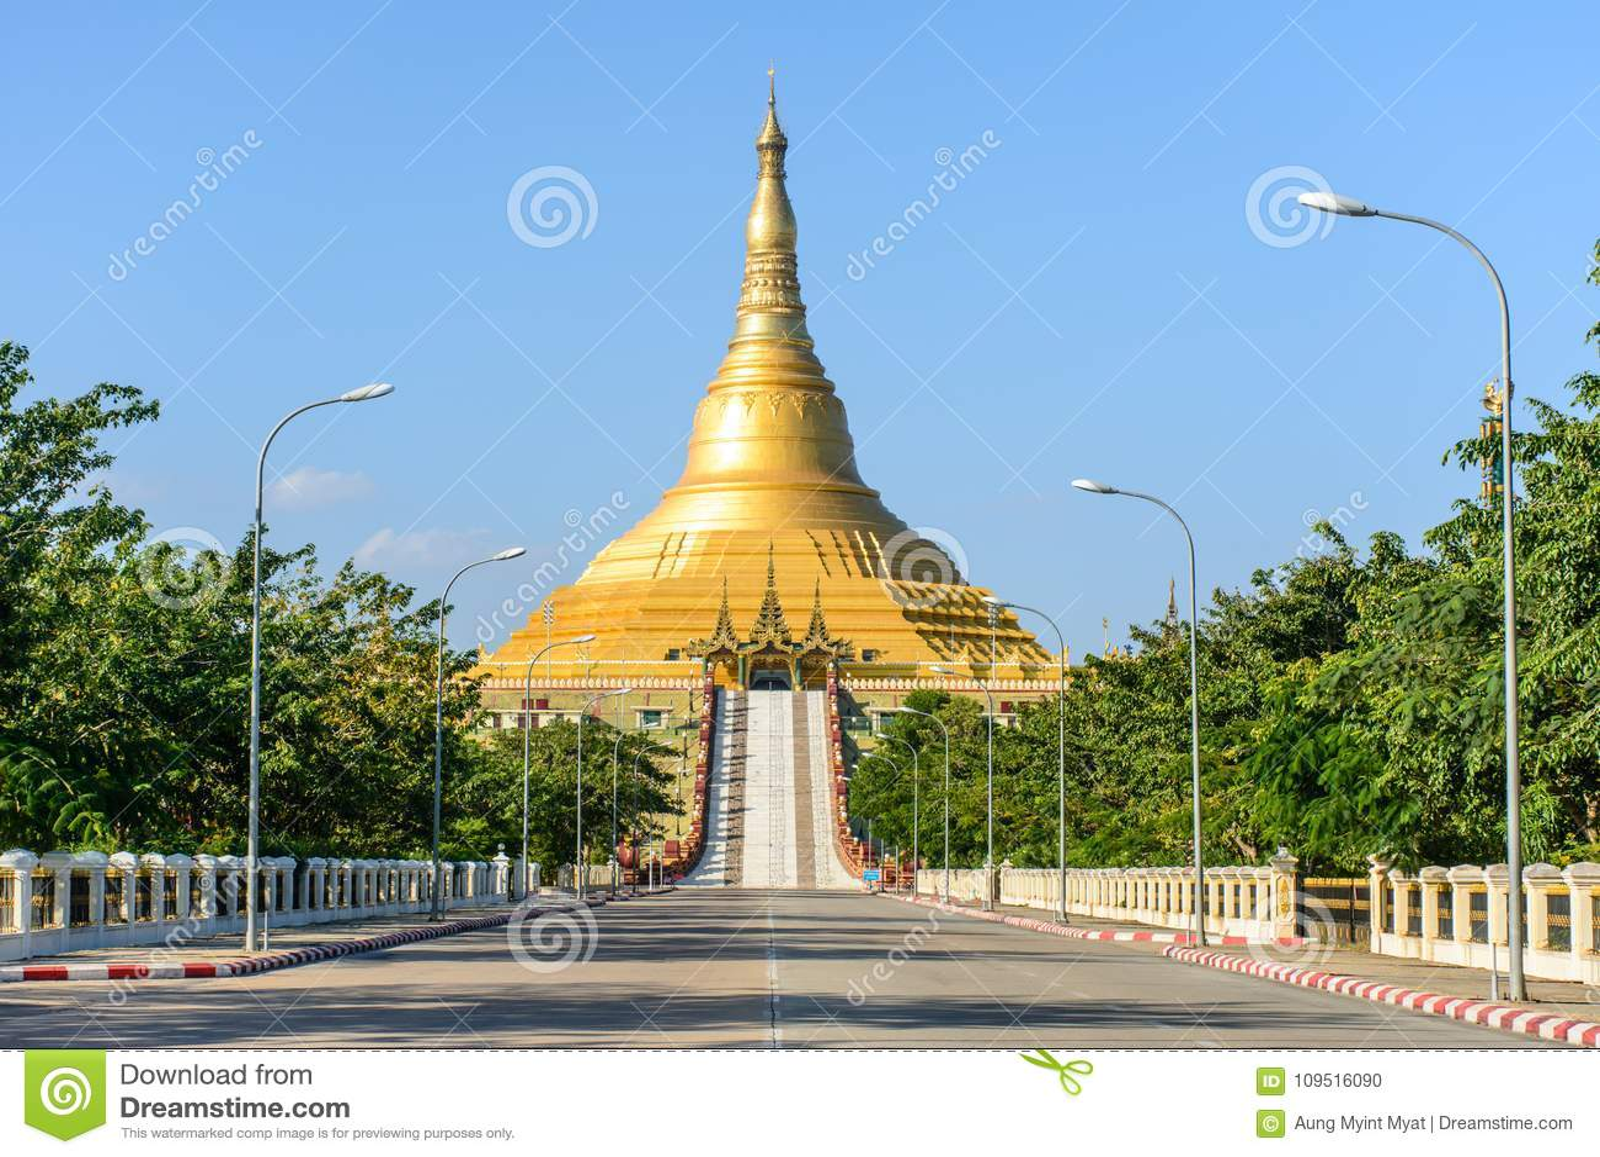 Uppatasanti pagod, Nay Pyi Taw, Myanmar